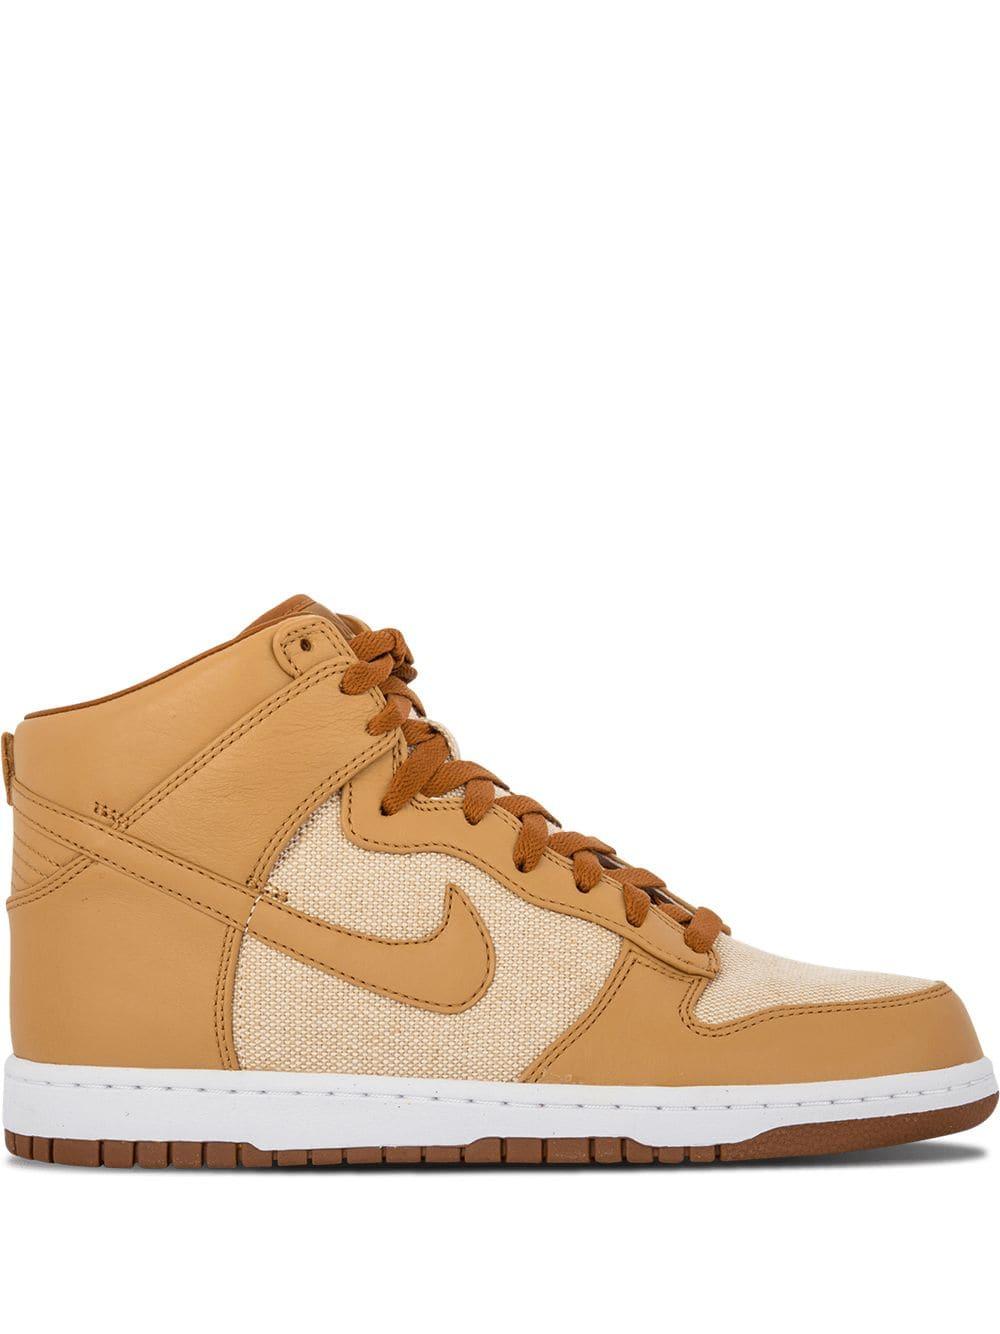 the best attitude 9da0e 45d36 Nike Dunk PRM HI SP sneakers - Natural Underbrush-Acorn